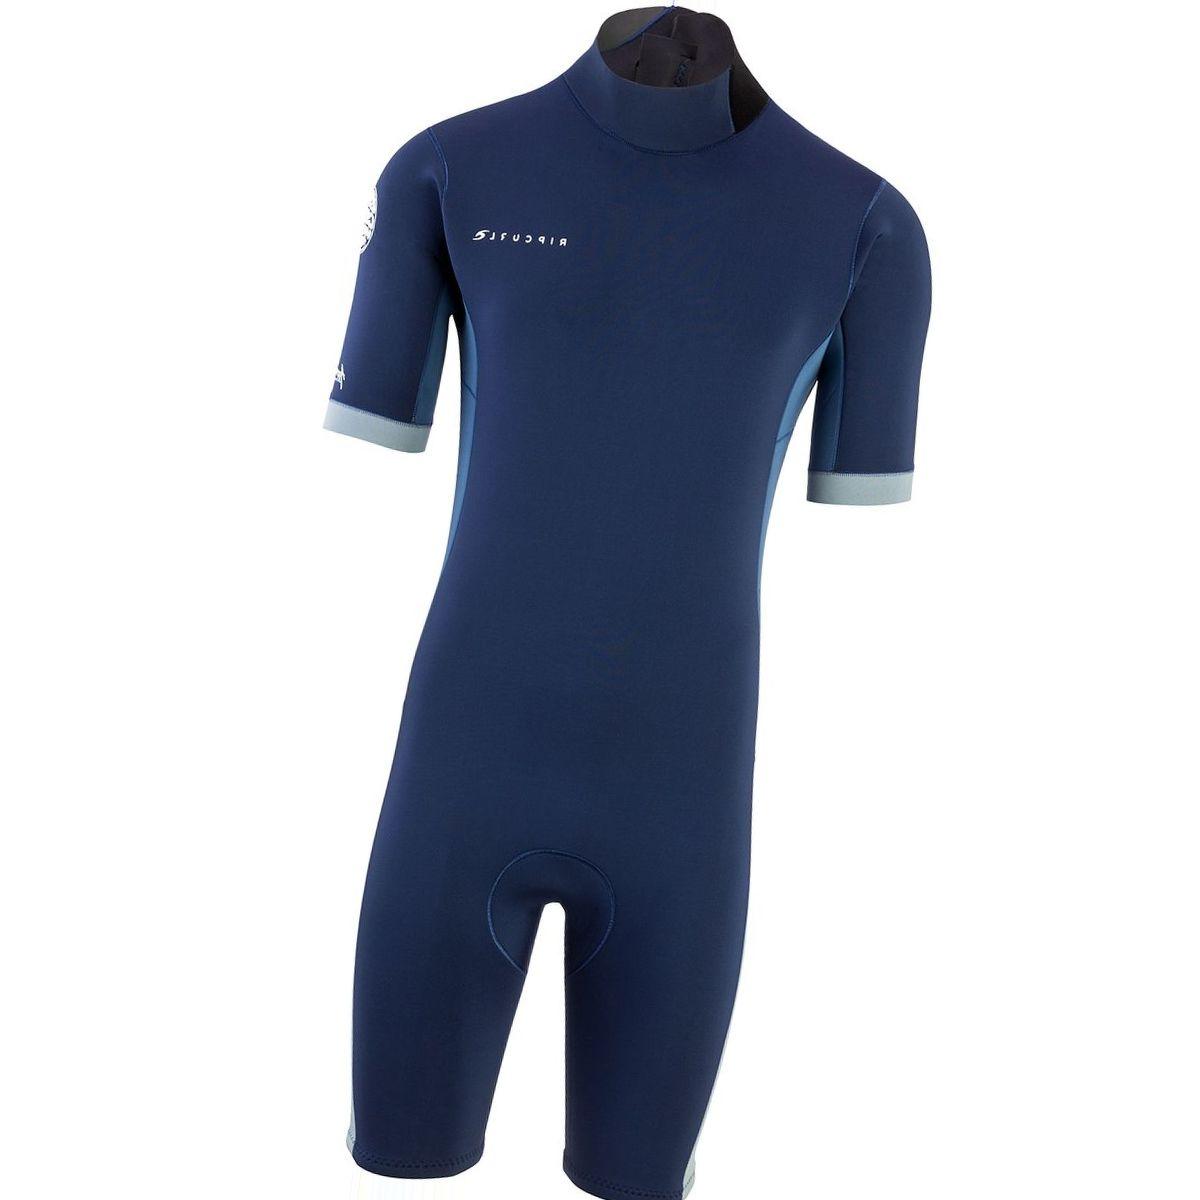 Rip Curl Aggrolite 2/2 Back-Zip Short-Sleeve Spring Wetsuit - Men's